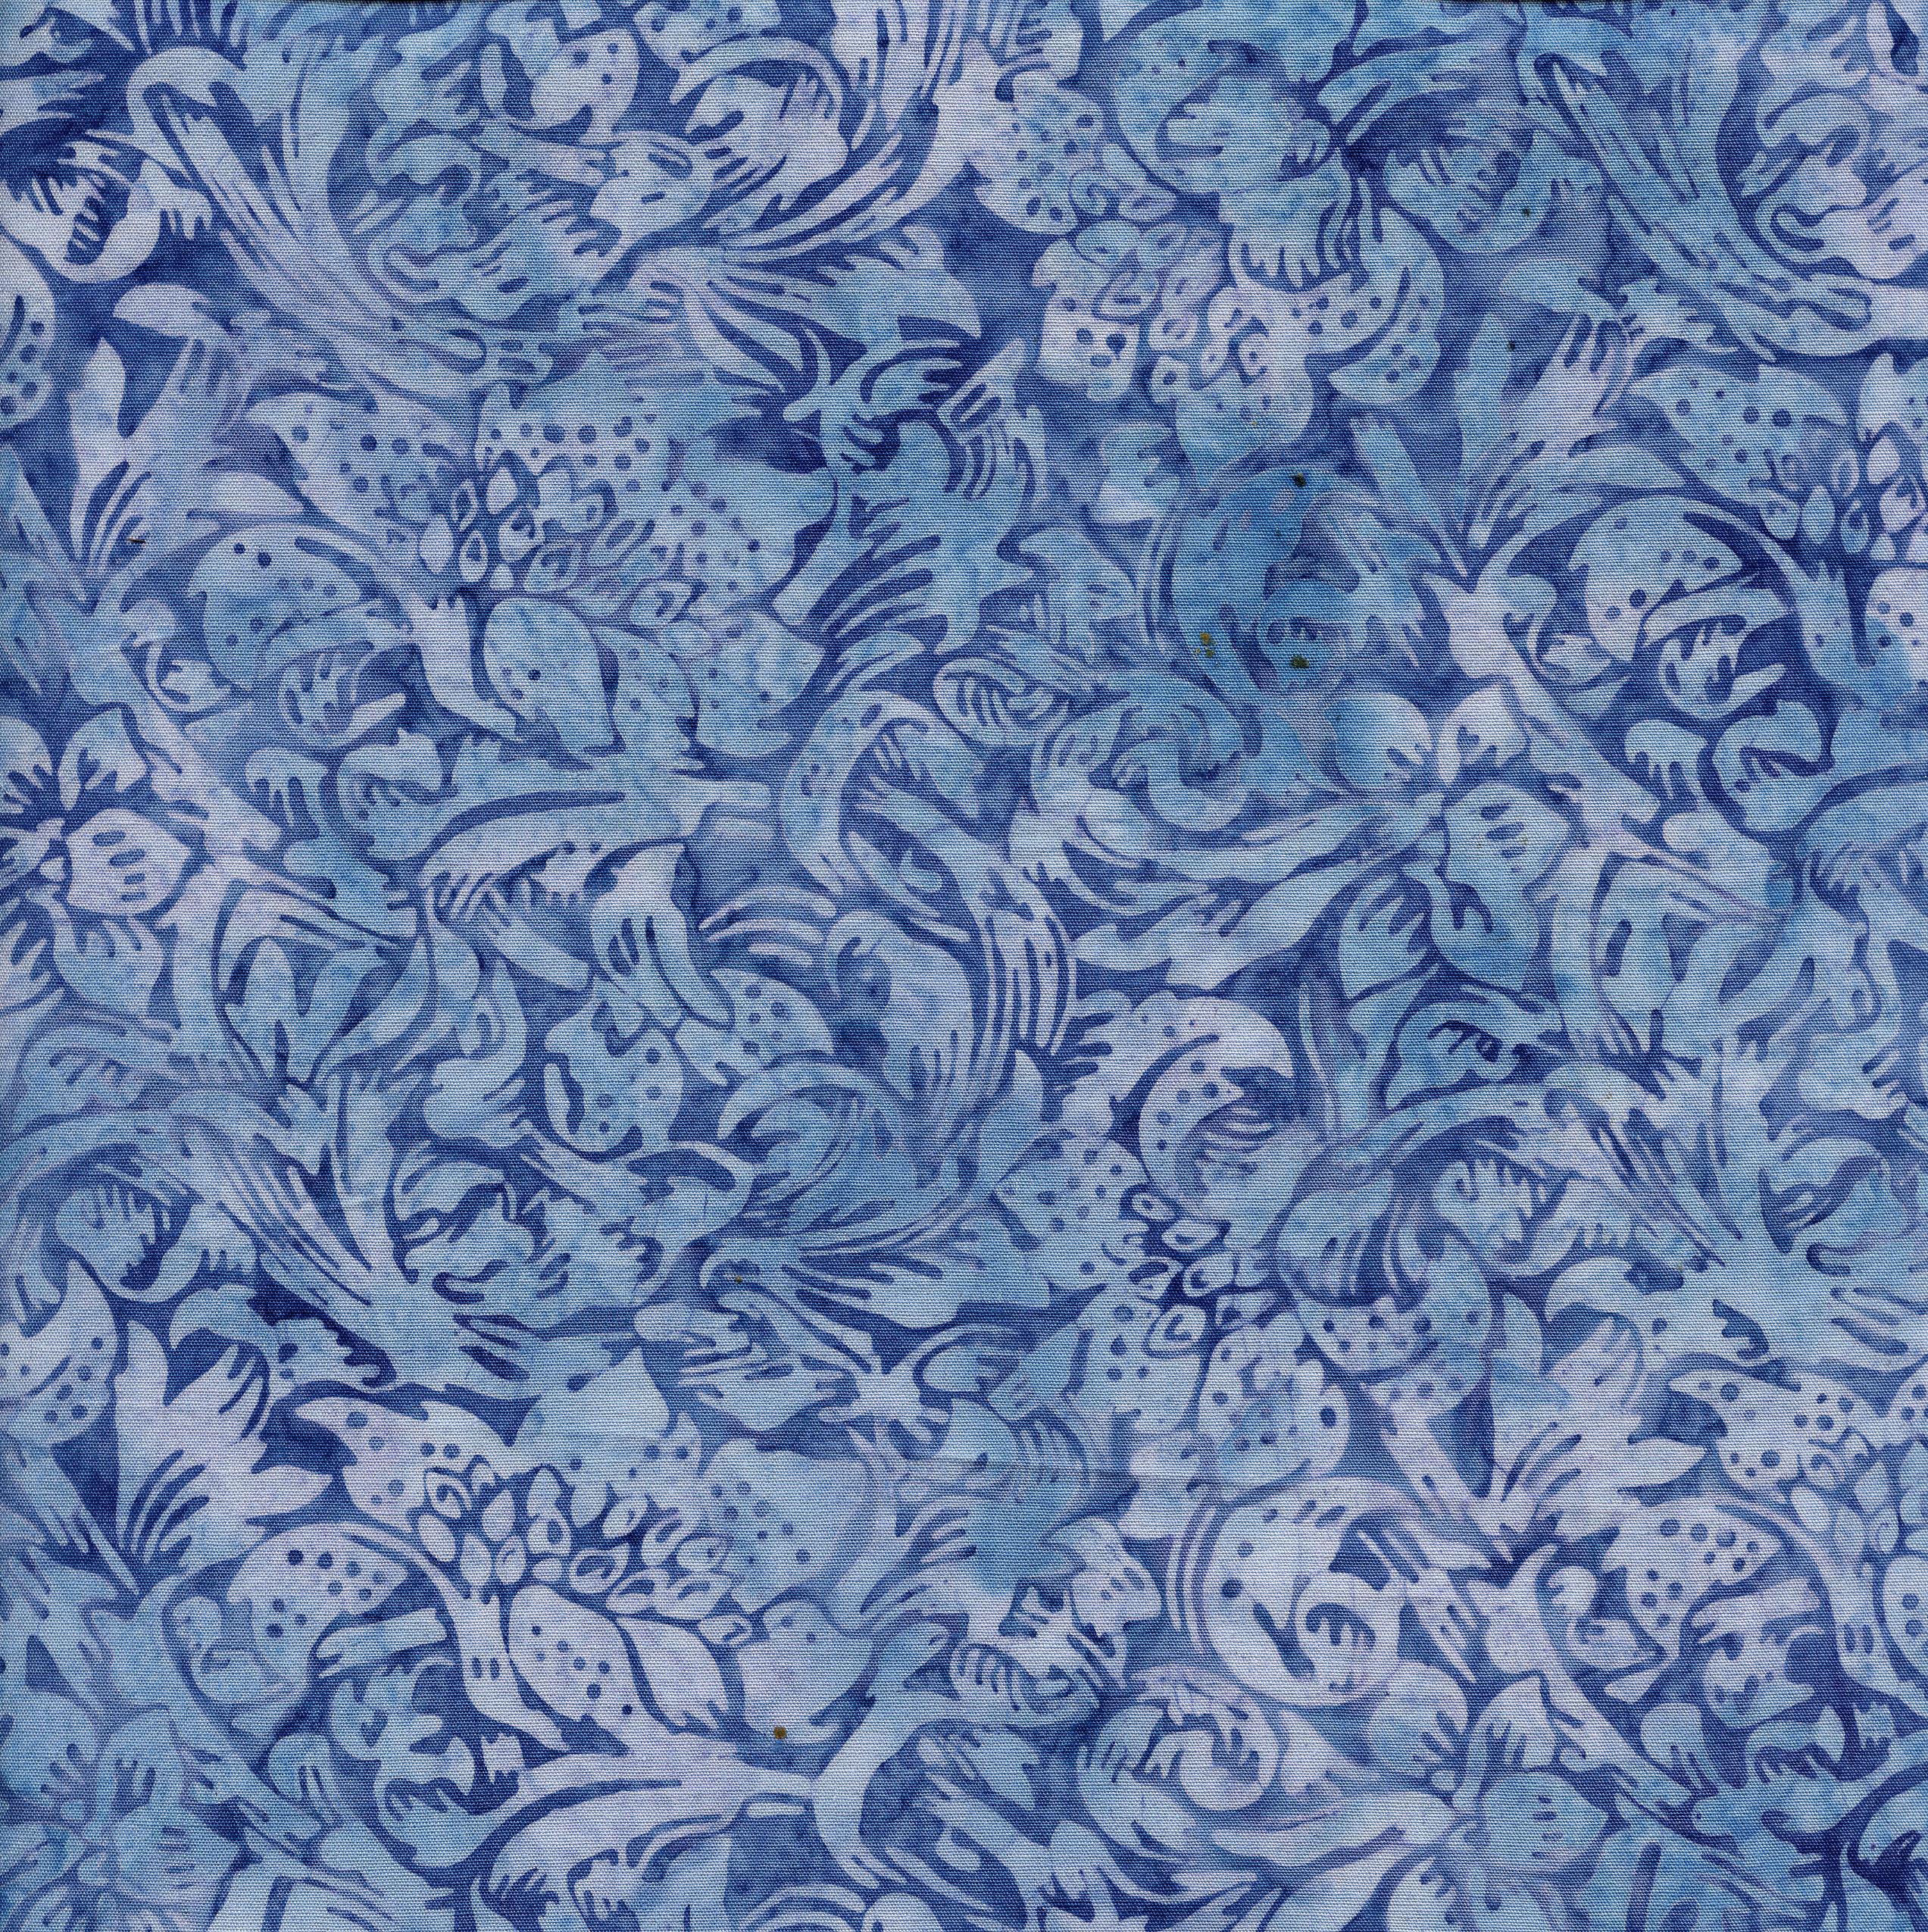 Island Batik Large Floral Vine - Periwinkle